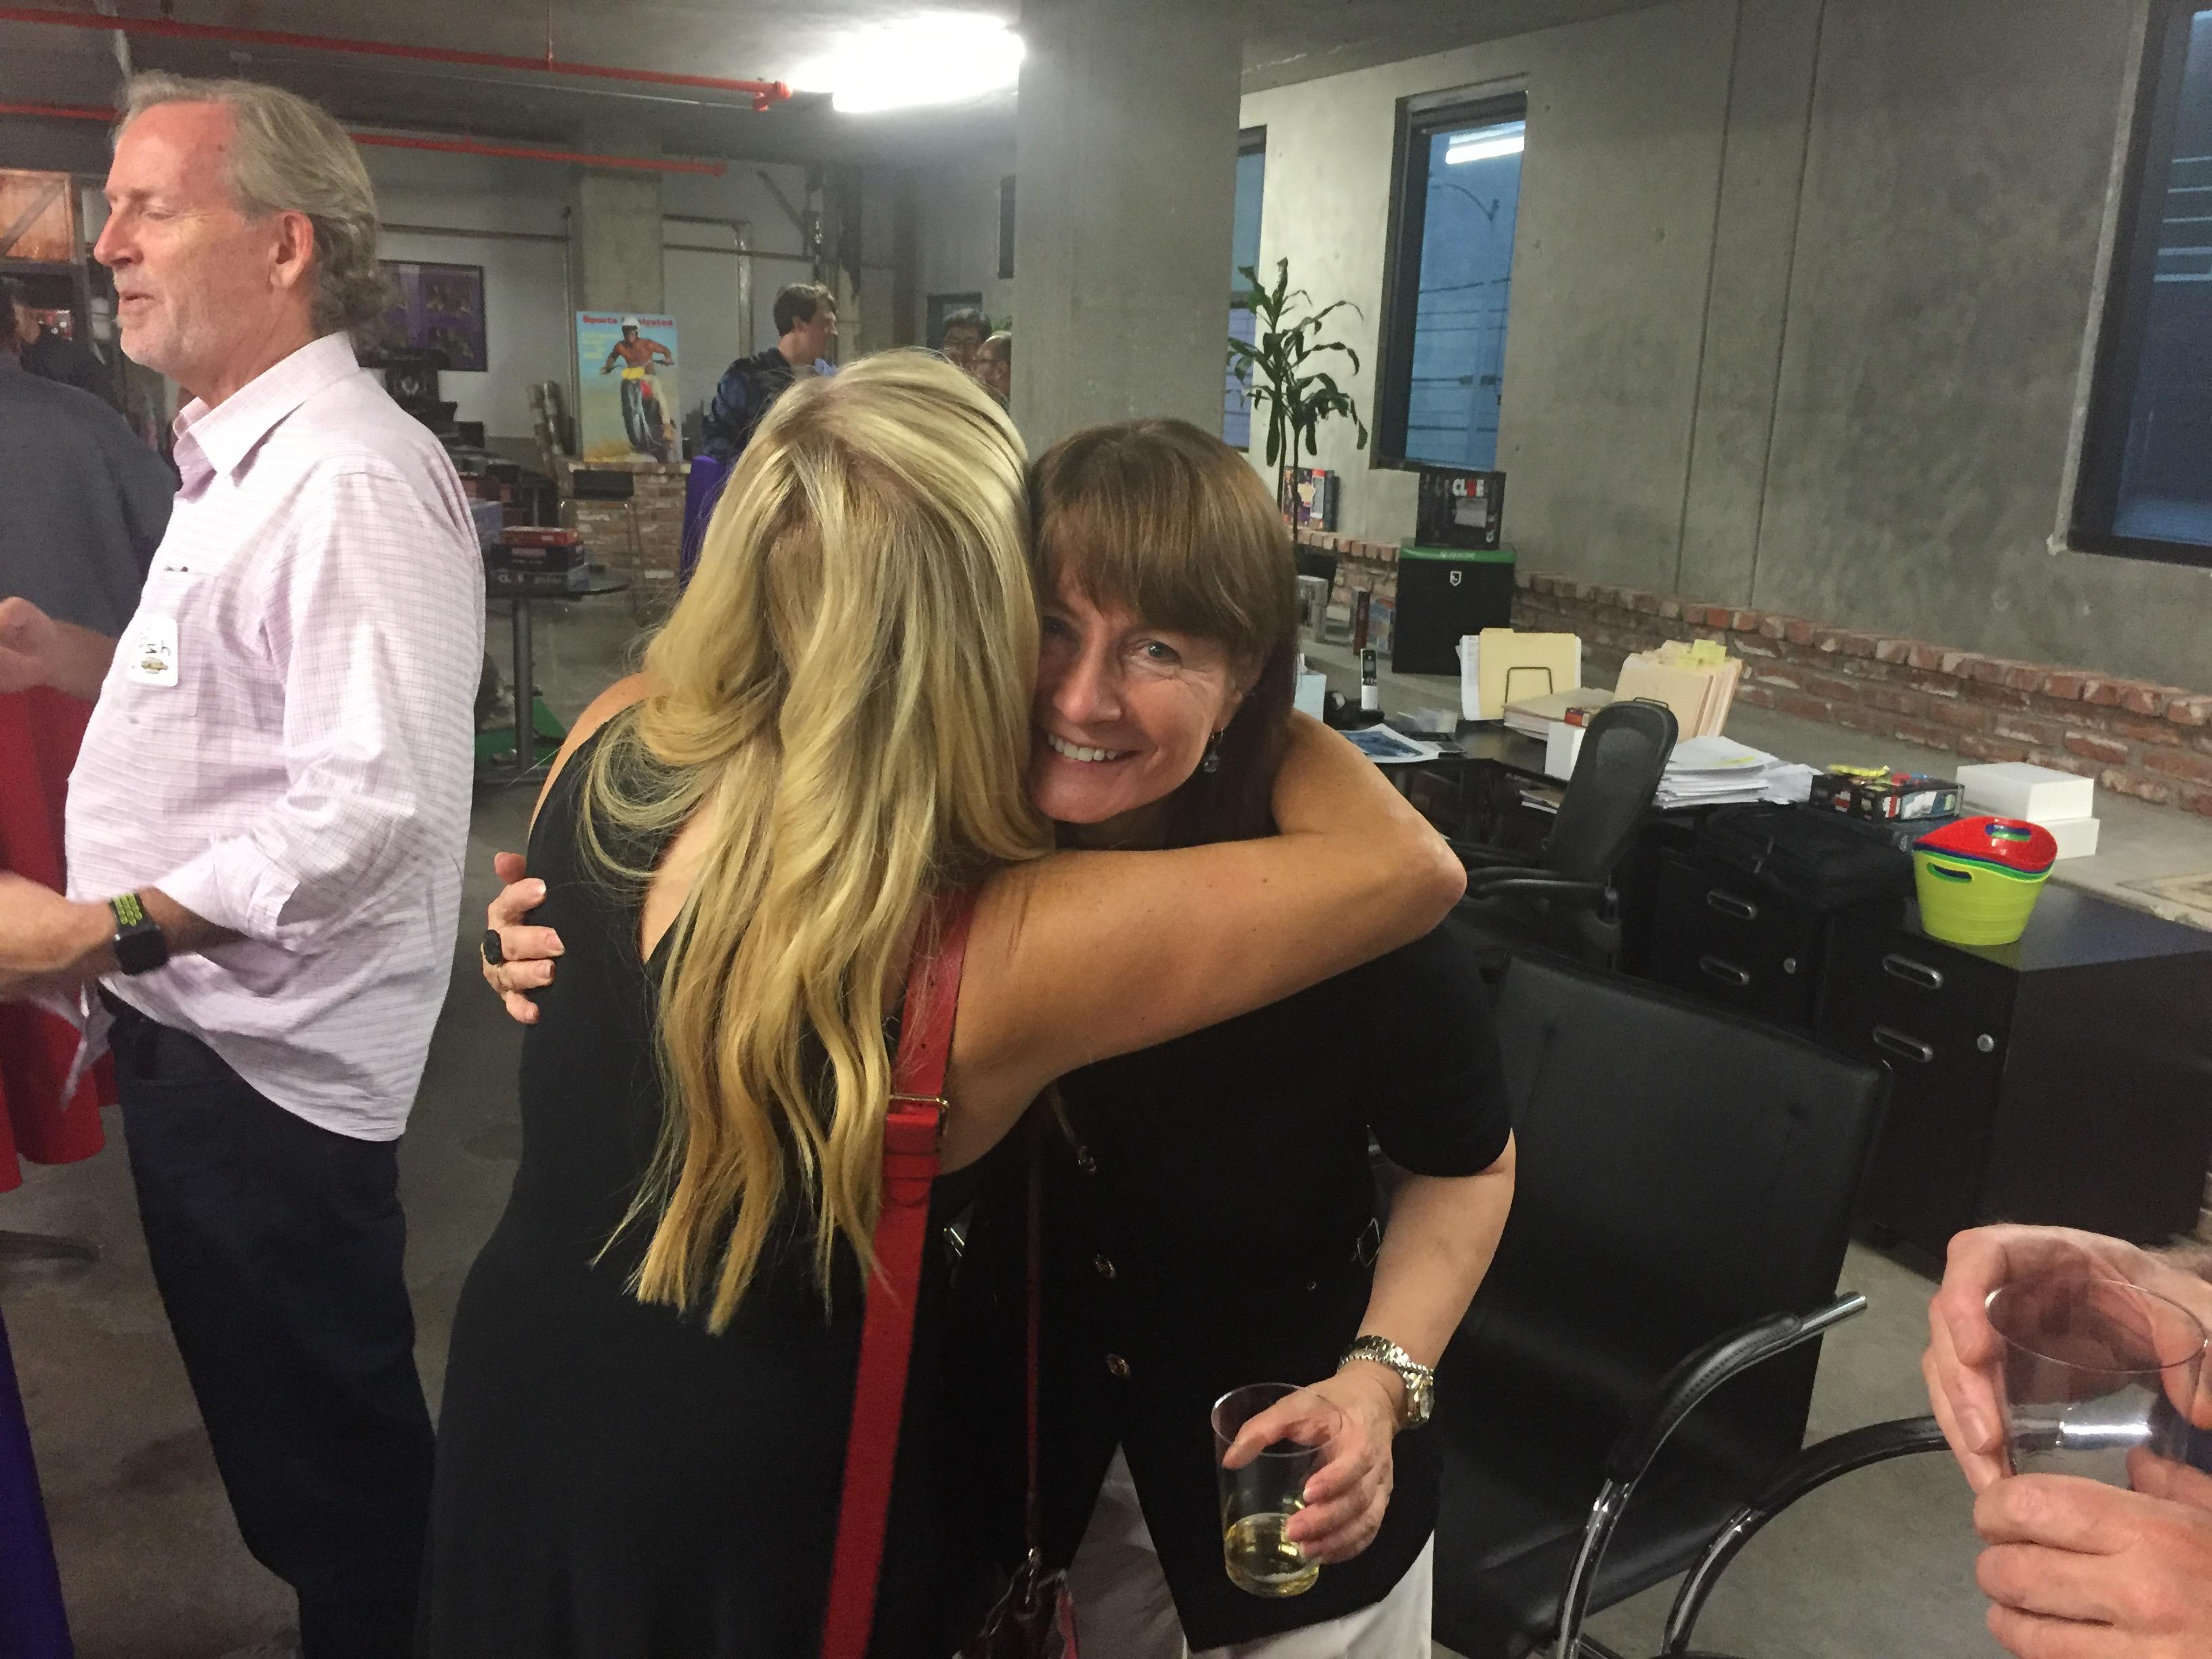 LA Sept 2019 event Kathleen hugging Mary